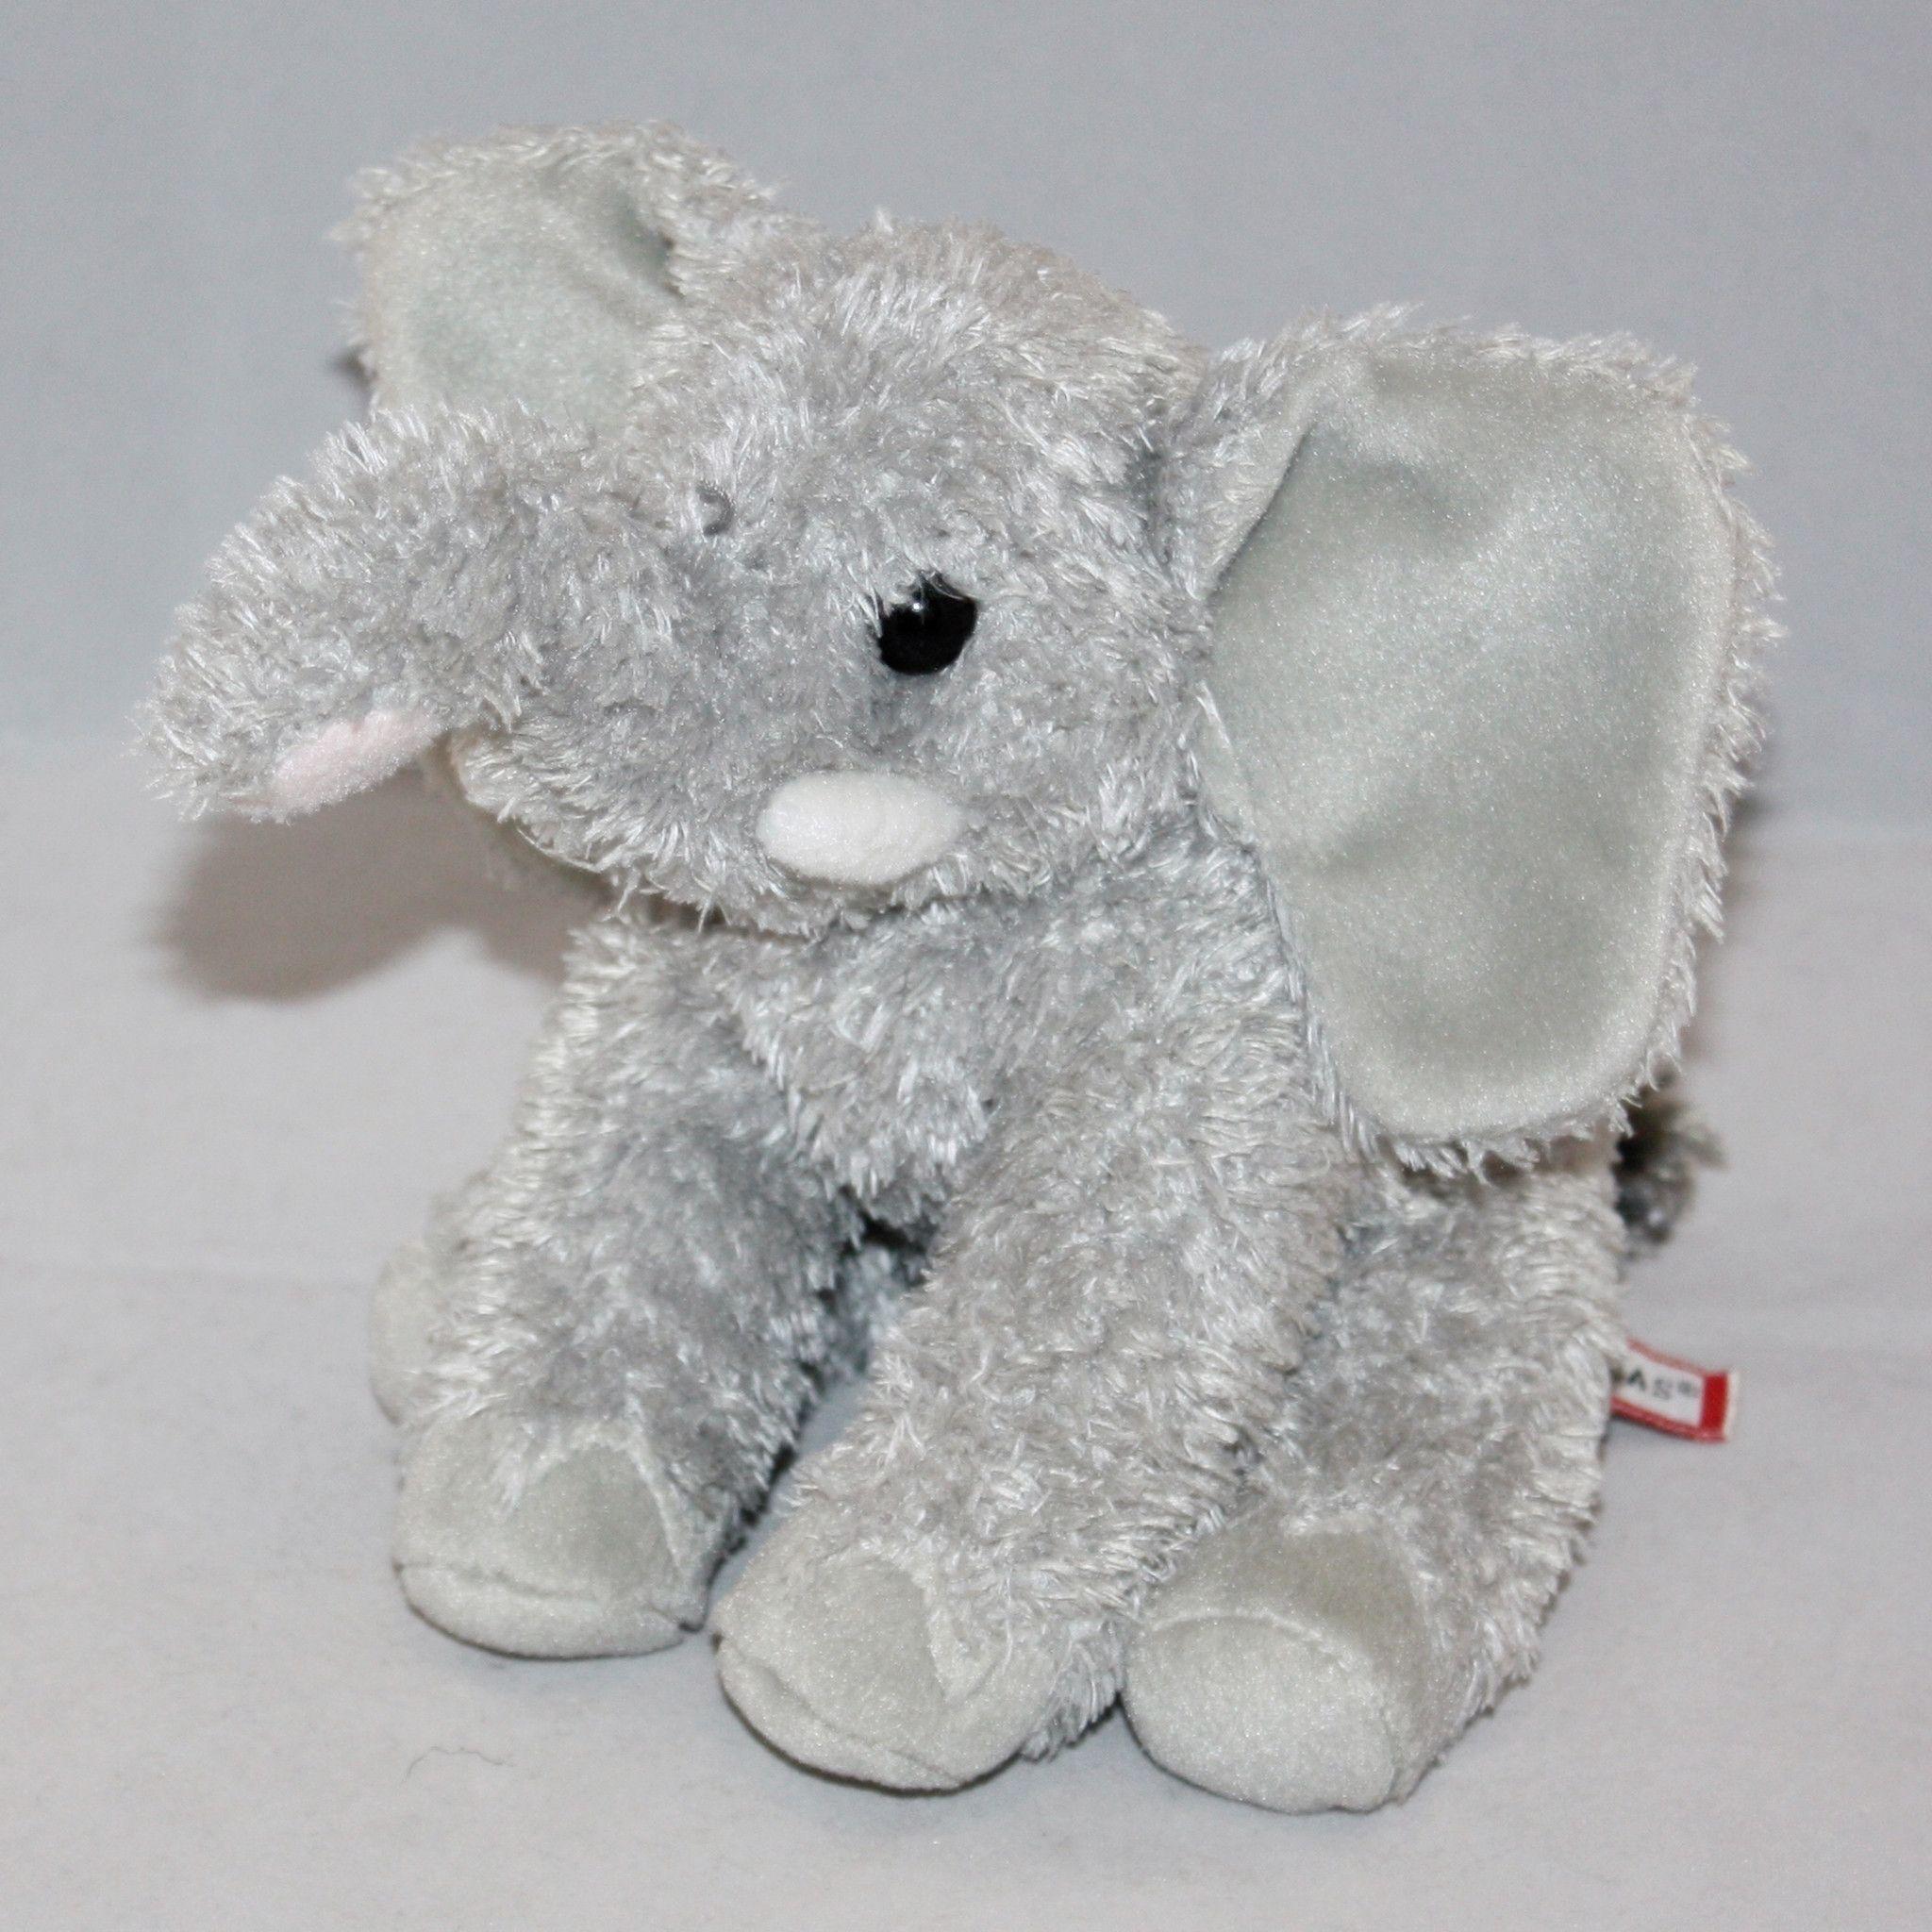 Pleasing Douglas Cuddle Toy Gray Elephant Beanbag Stuffed Plush Ibusinesslaw Wood Chair Design Ideas Ibusinesslaworg